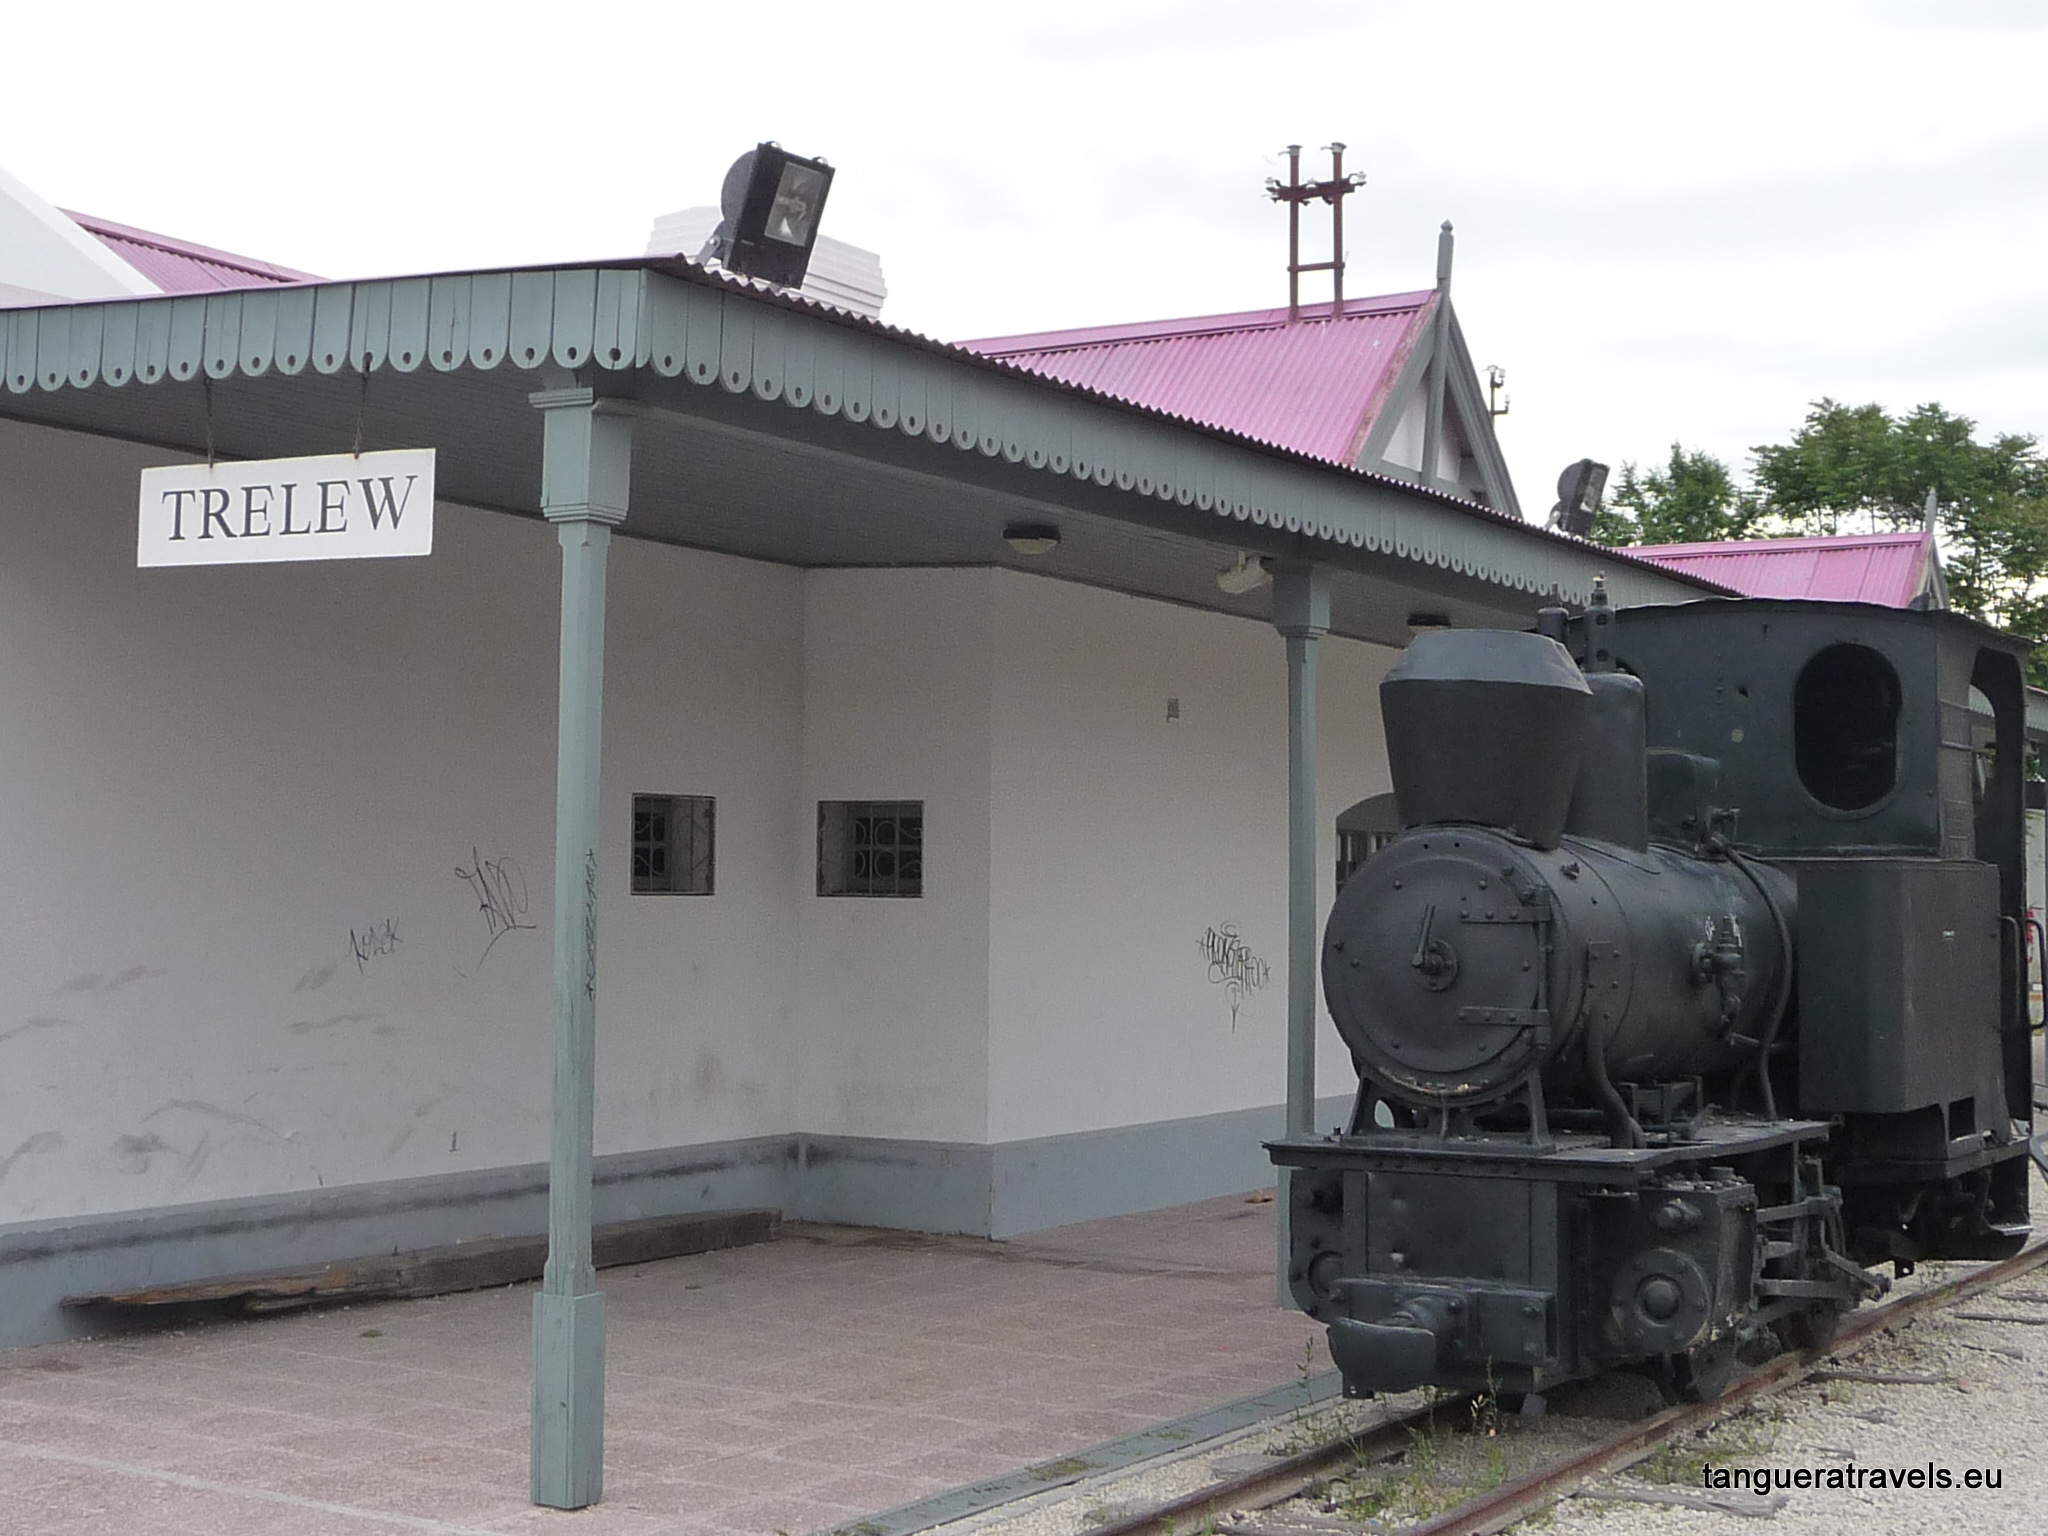 old train station, Trelew